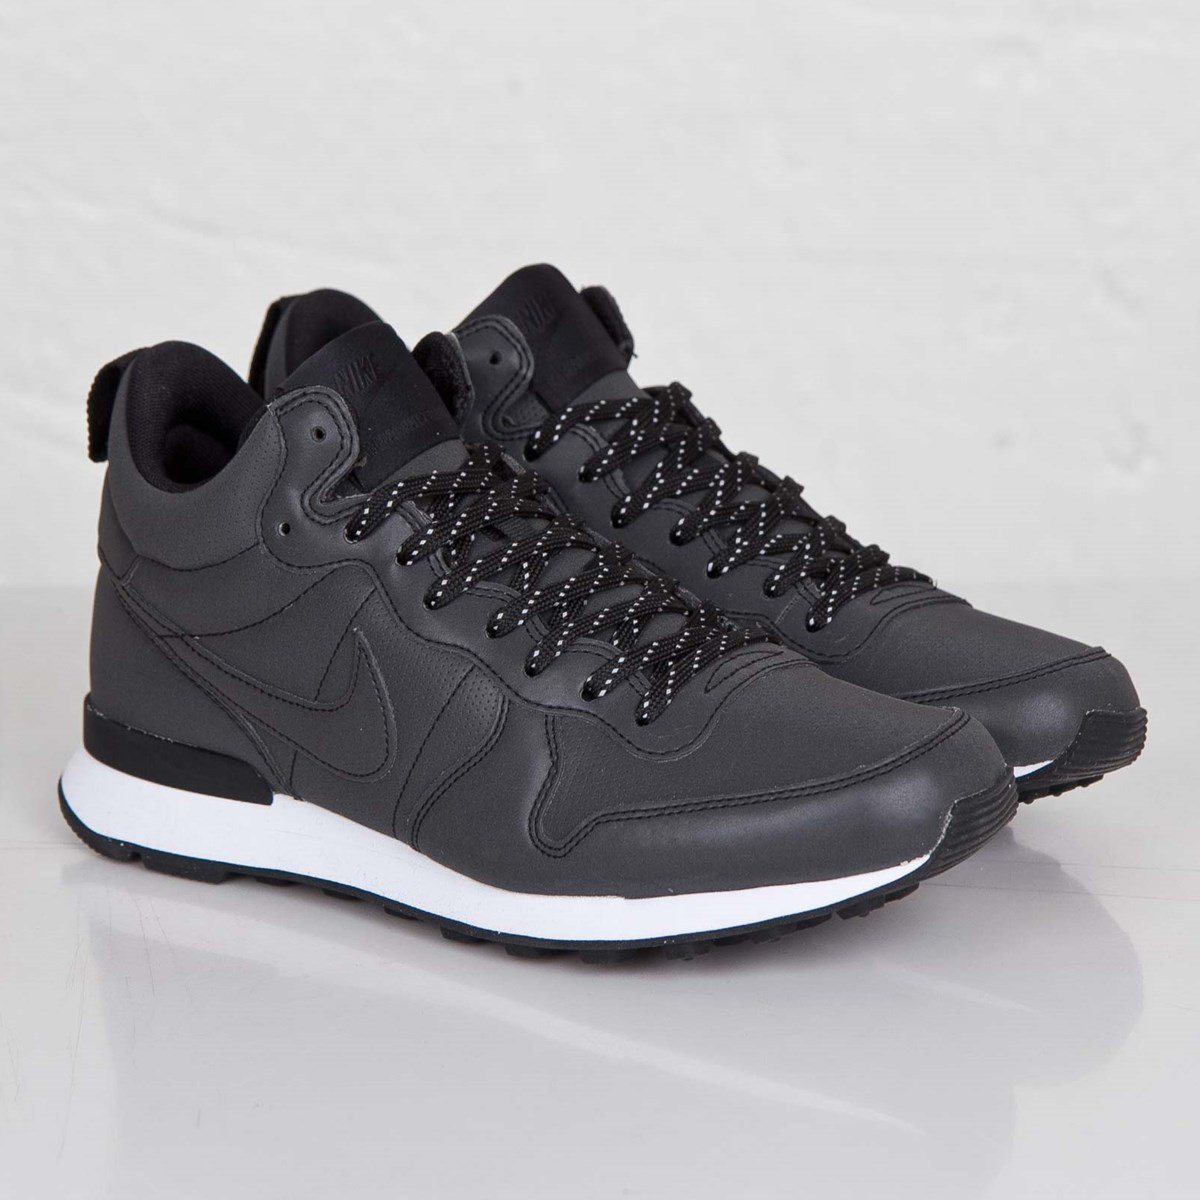 Nike Internationalist Mid Premium - 682843-001 - SNS   sneakers & streetwear online since 1999